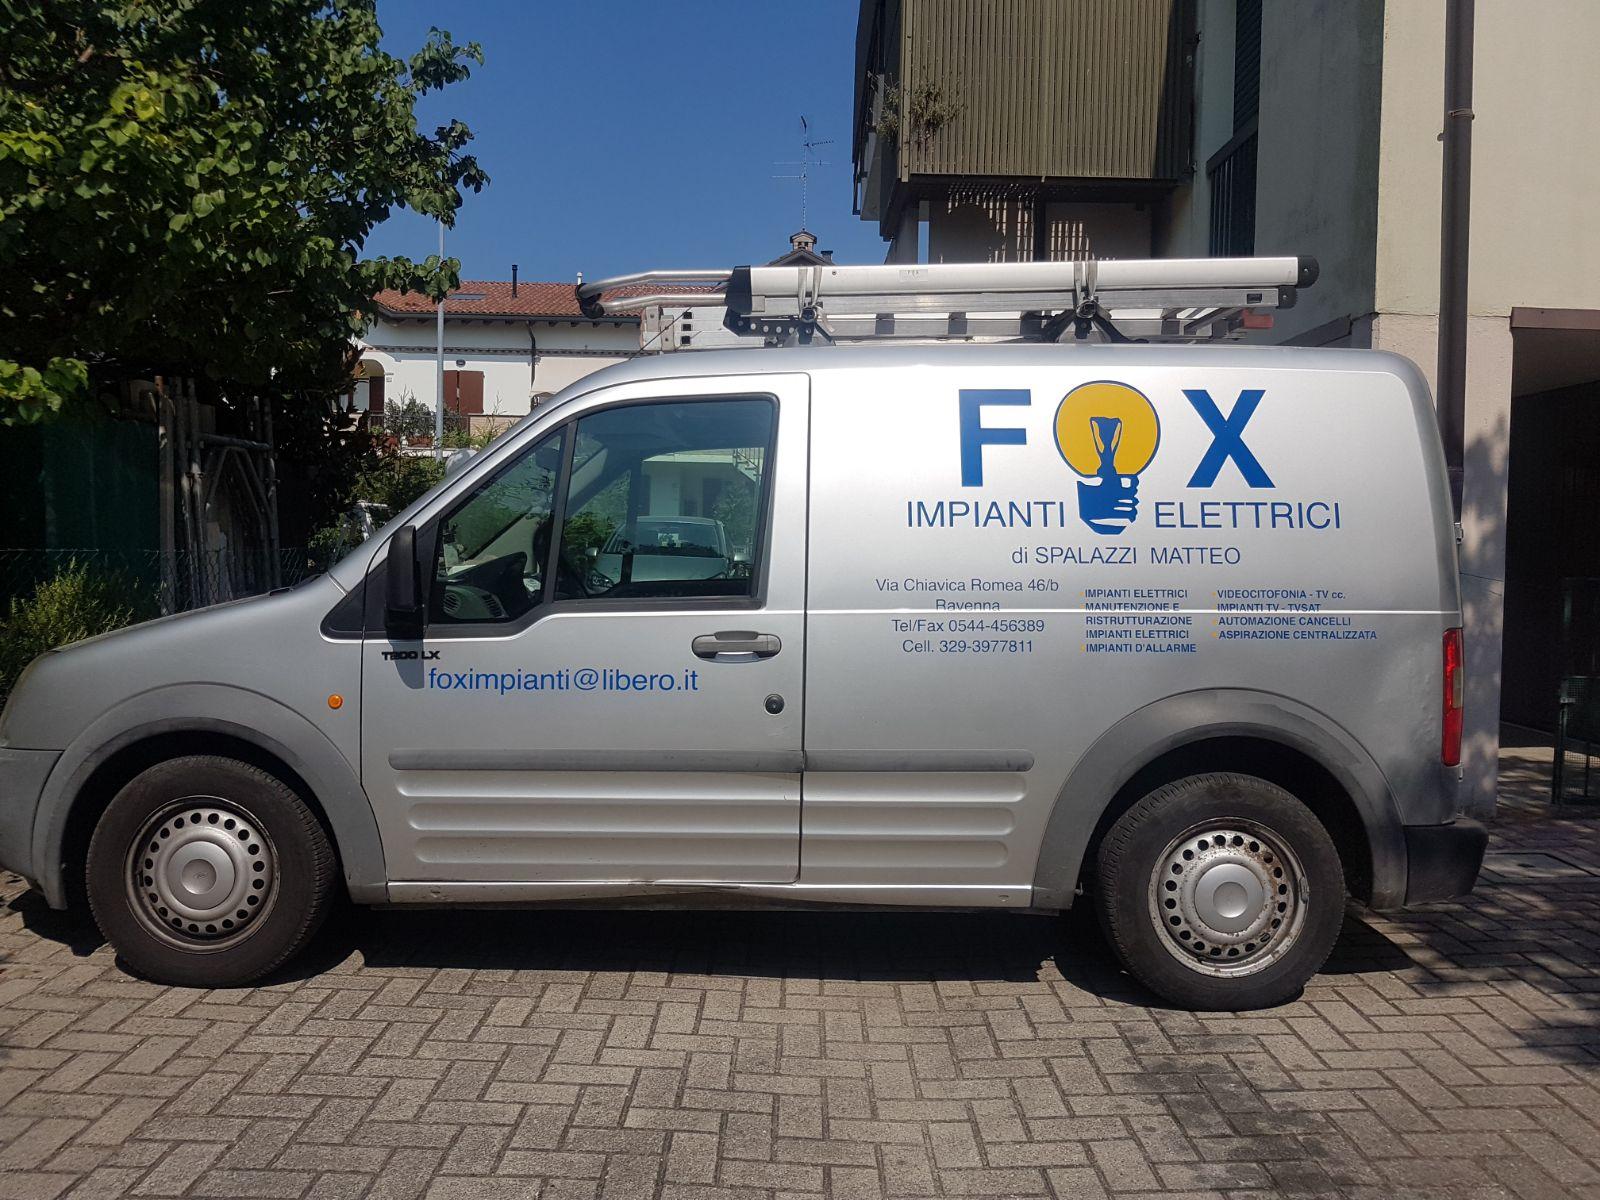 fox impianti elettrici